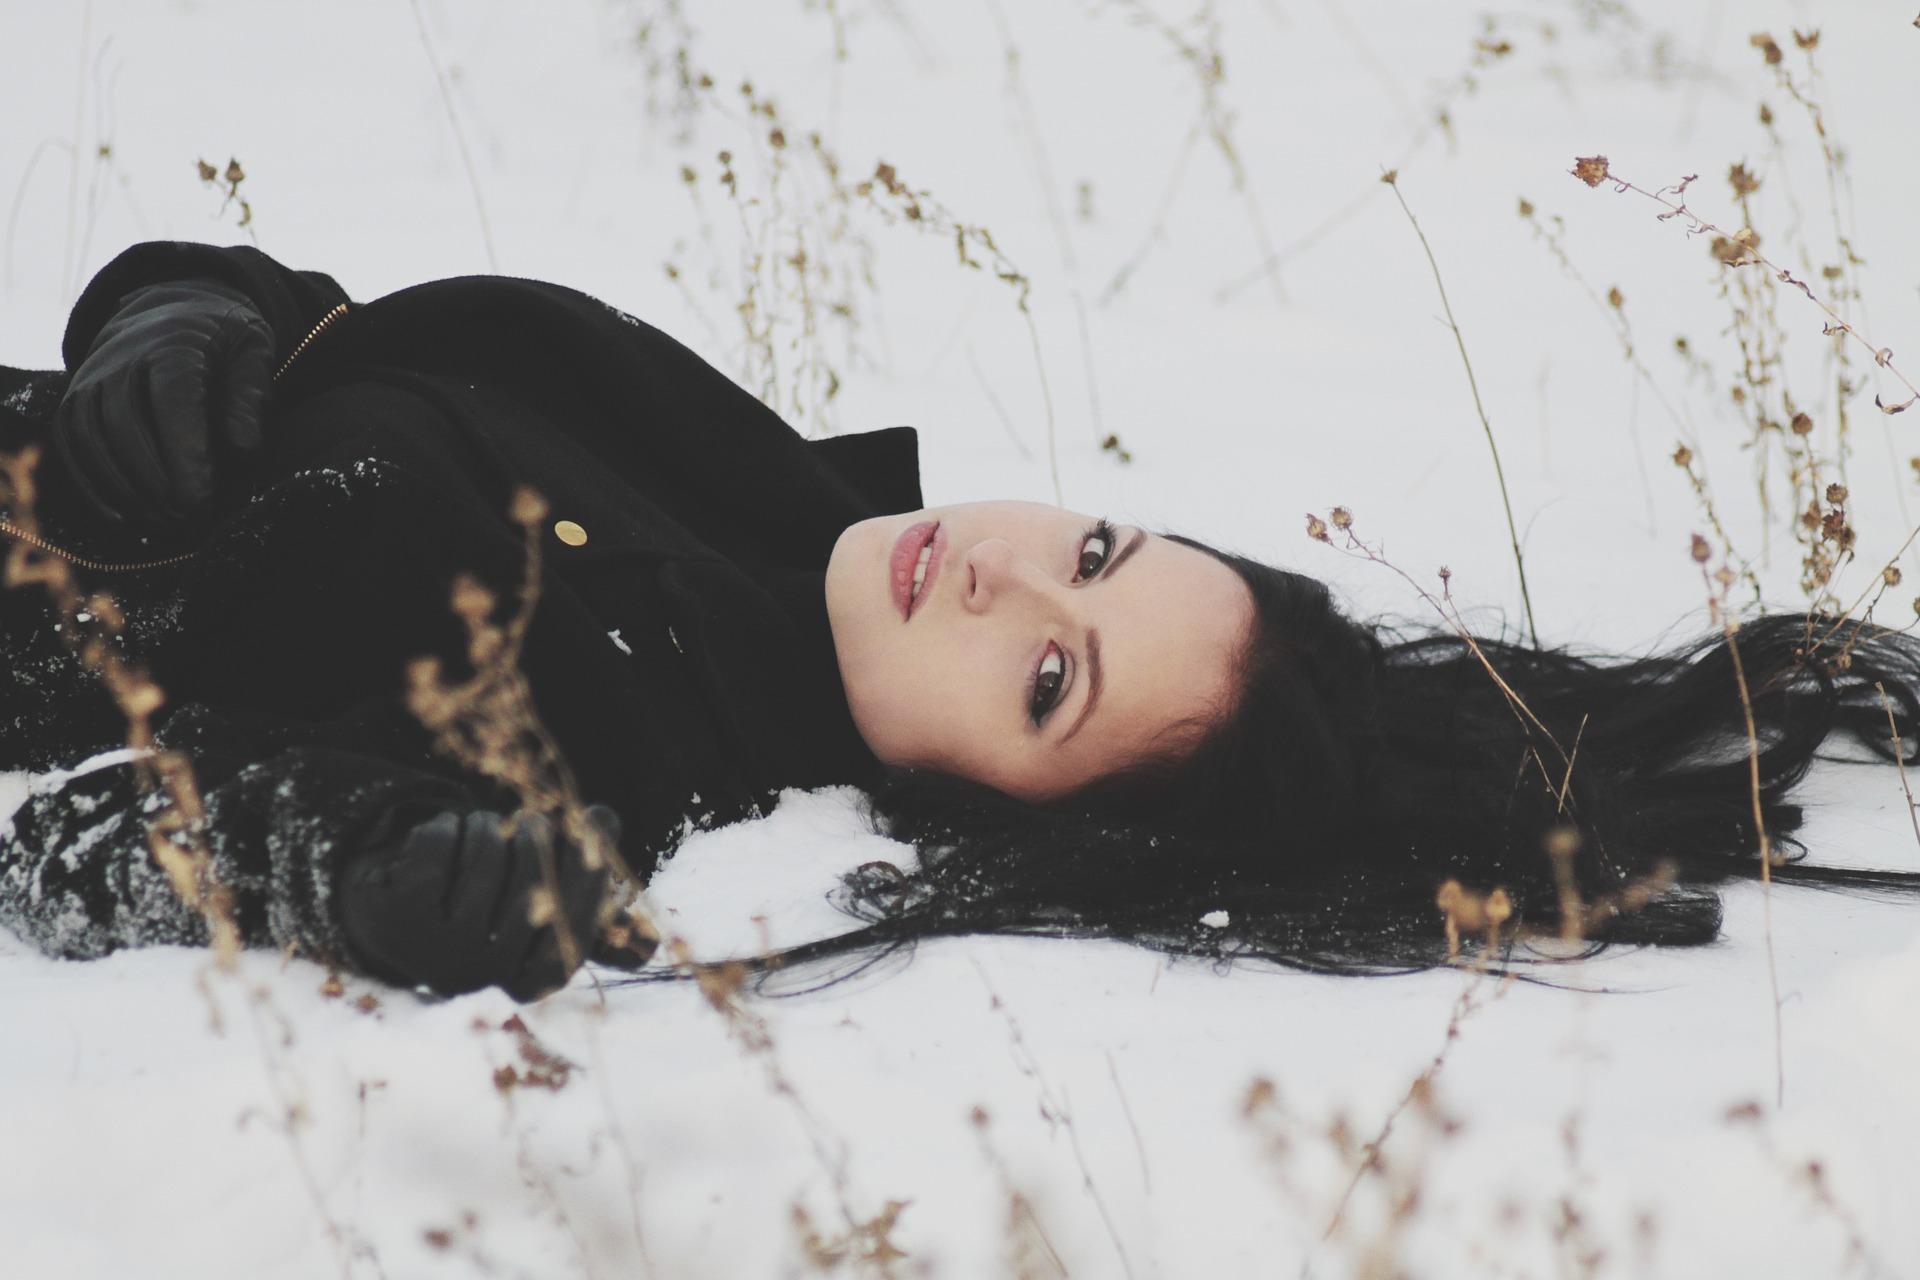 Winterbräune